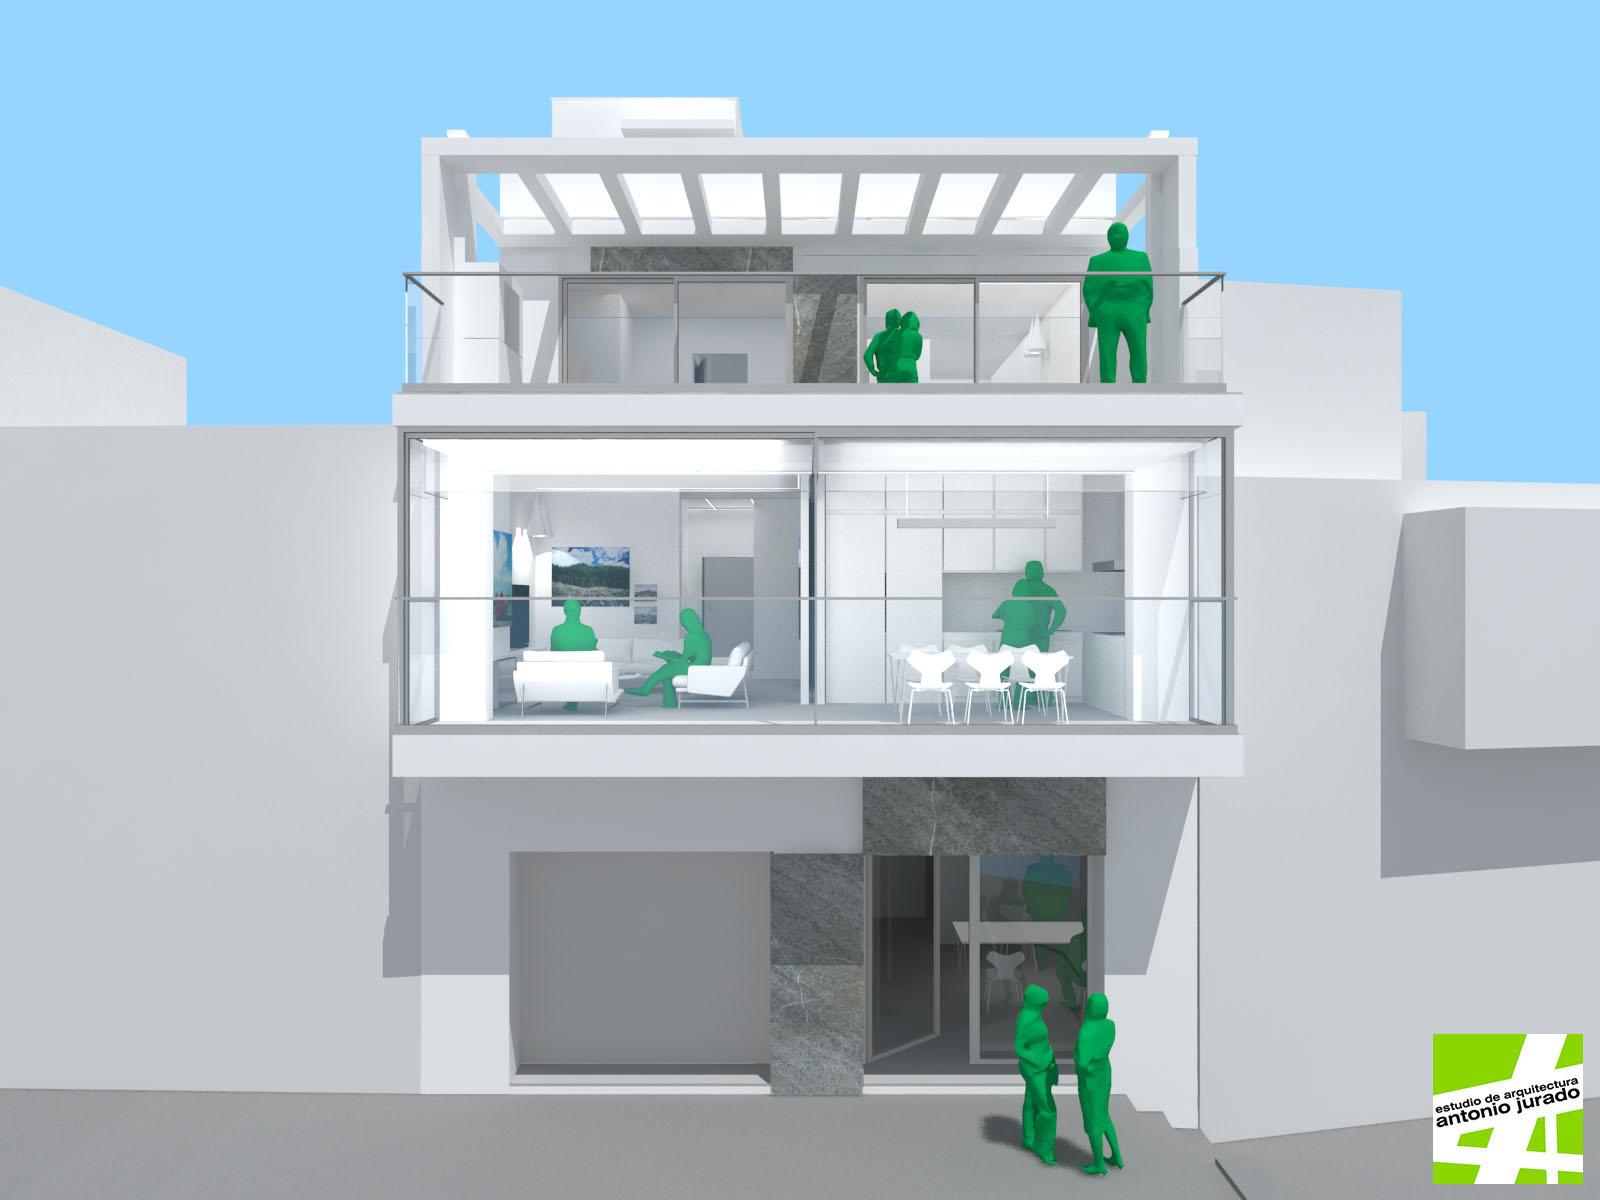 casa-ra-house-torrox-malaga-antonio-jurado-arquitecto-07.jpg